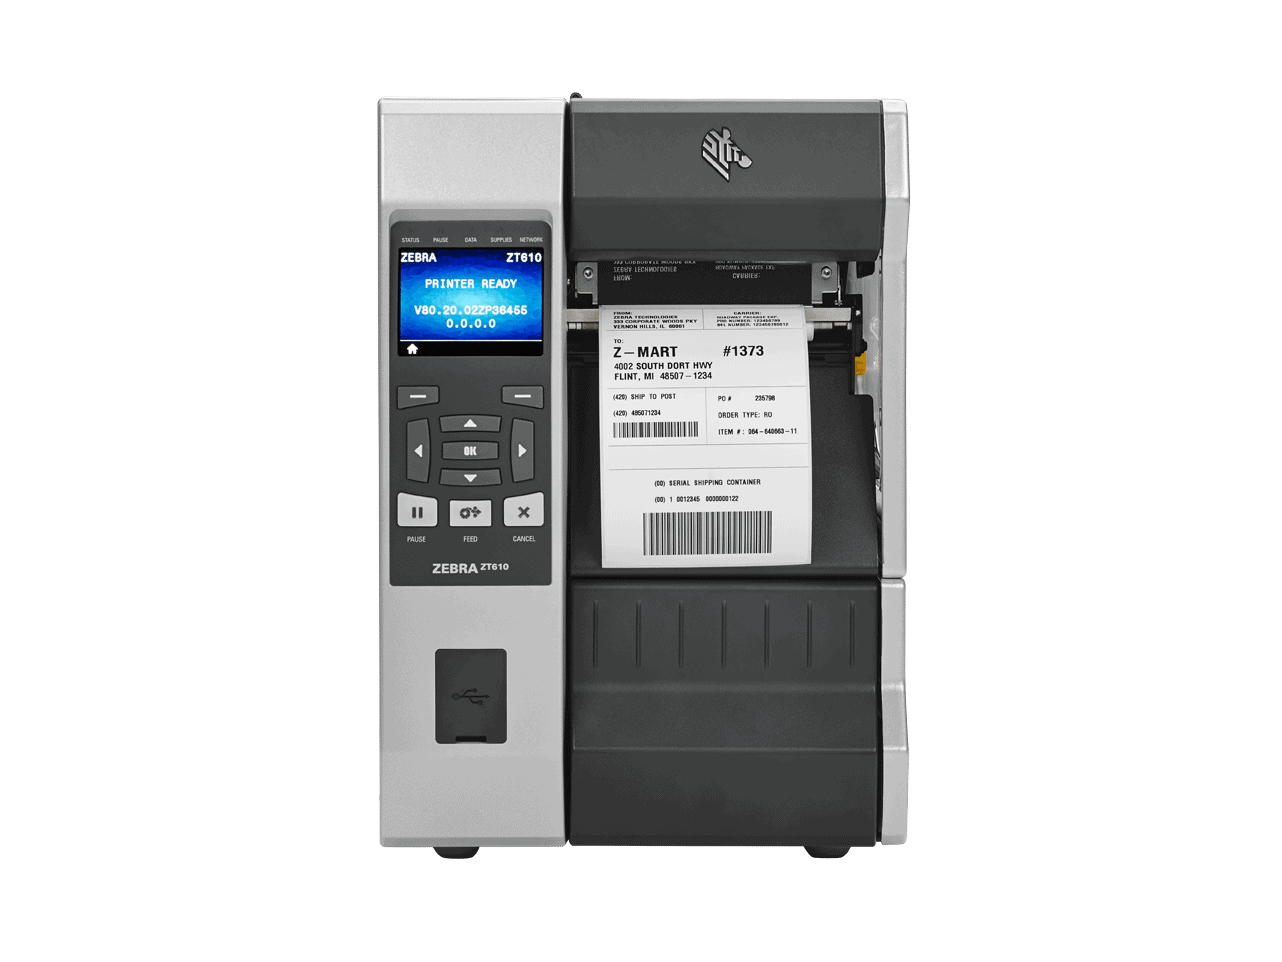 Zebra ZT610